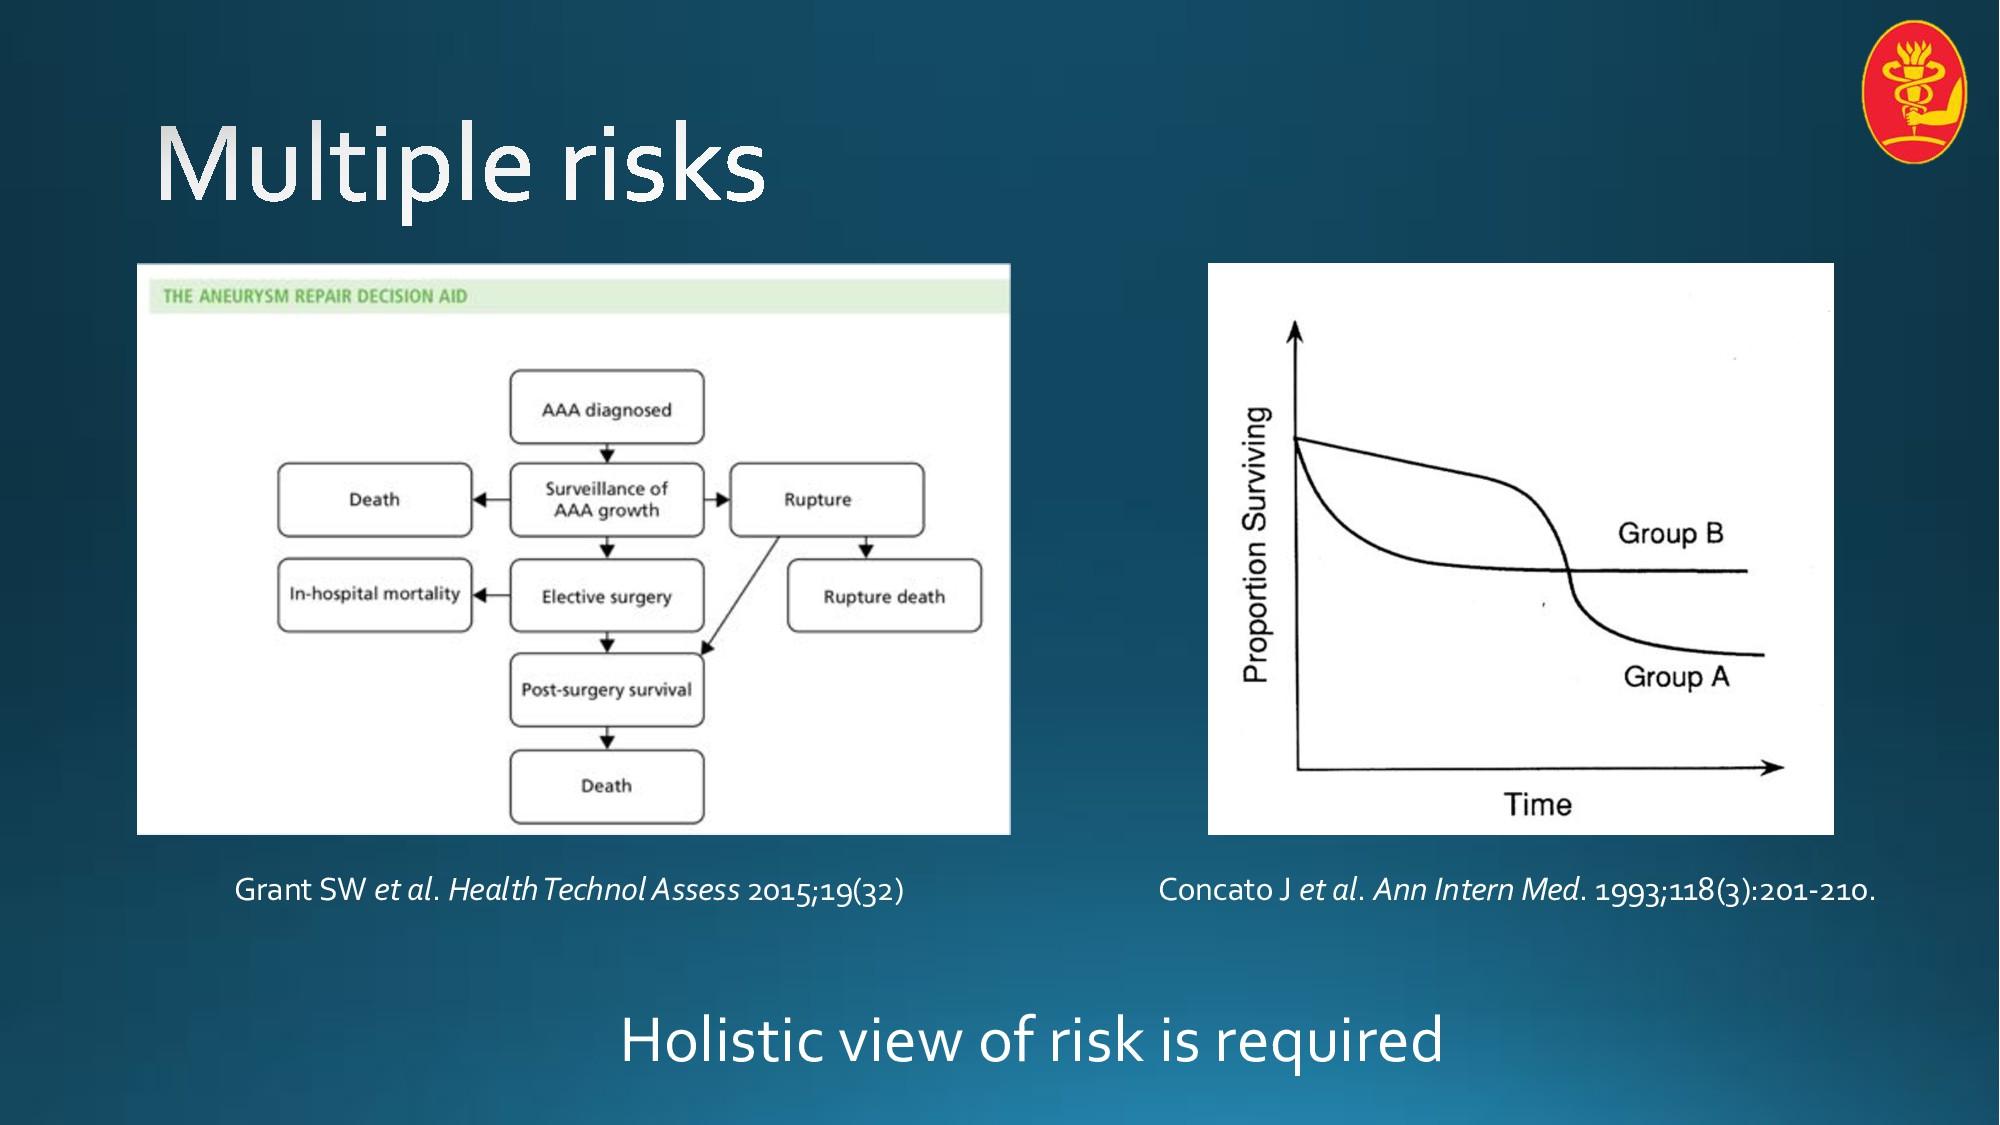 Grant SW et al. Health Technol Assess 2015;19(3...